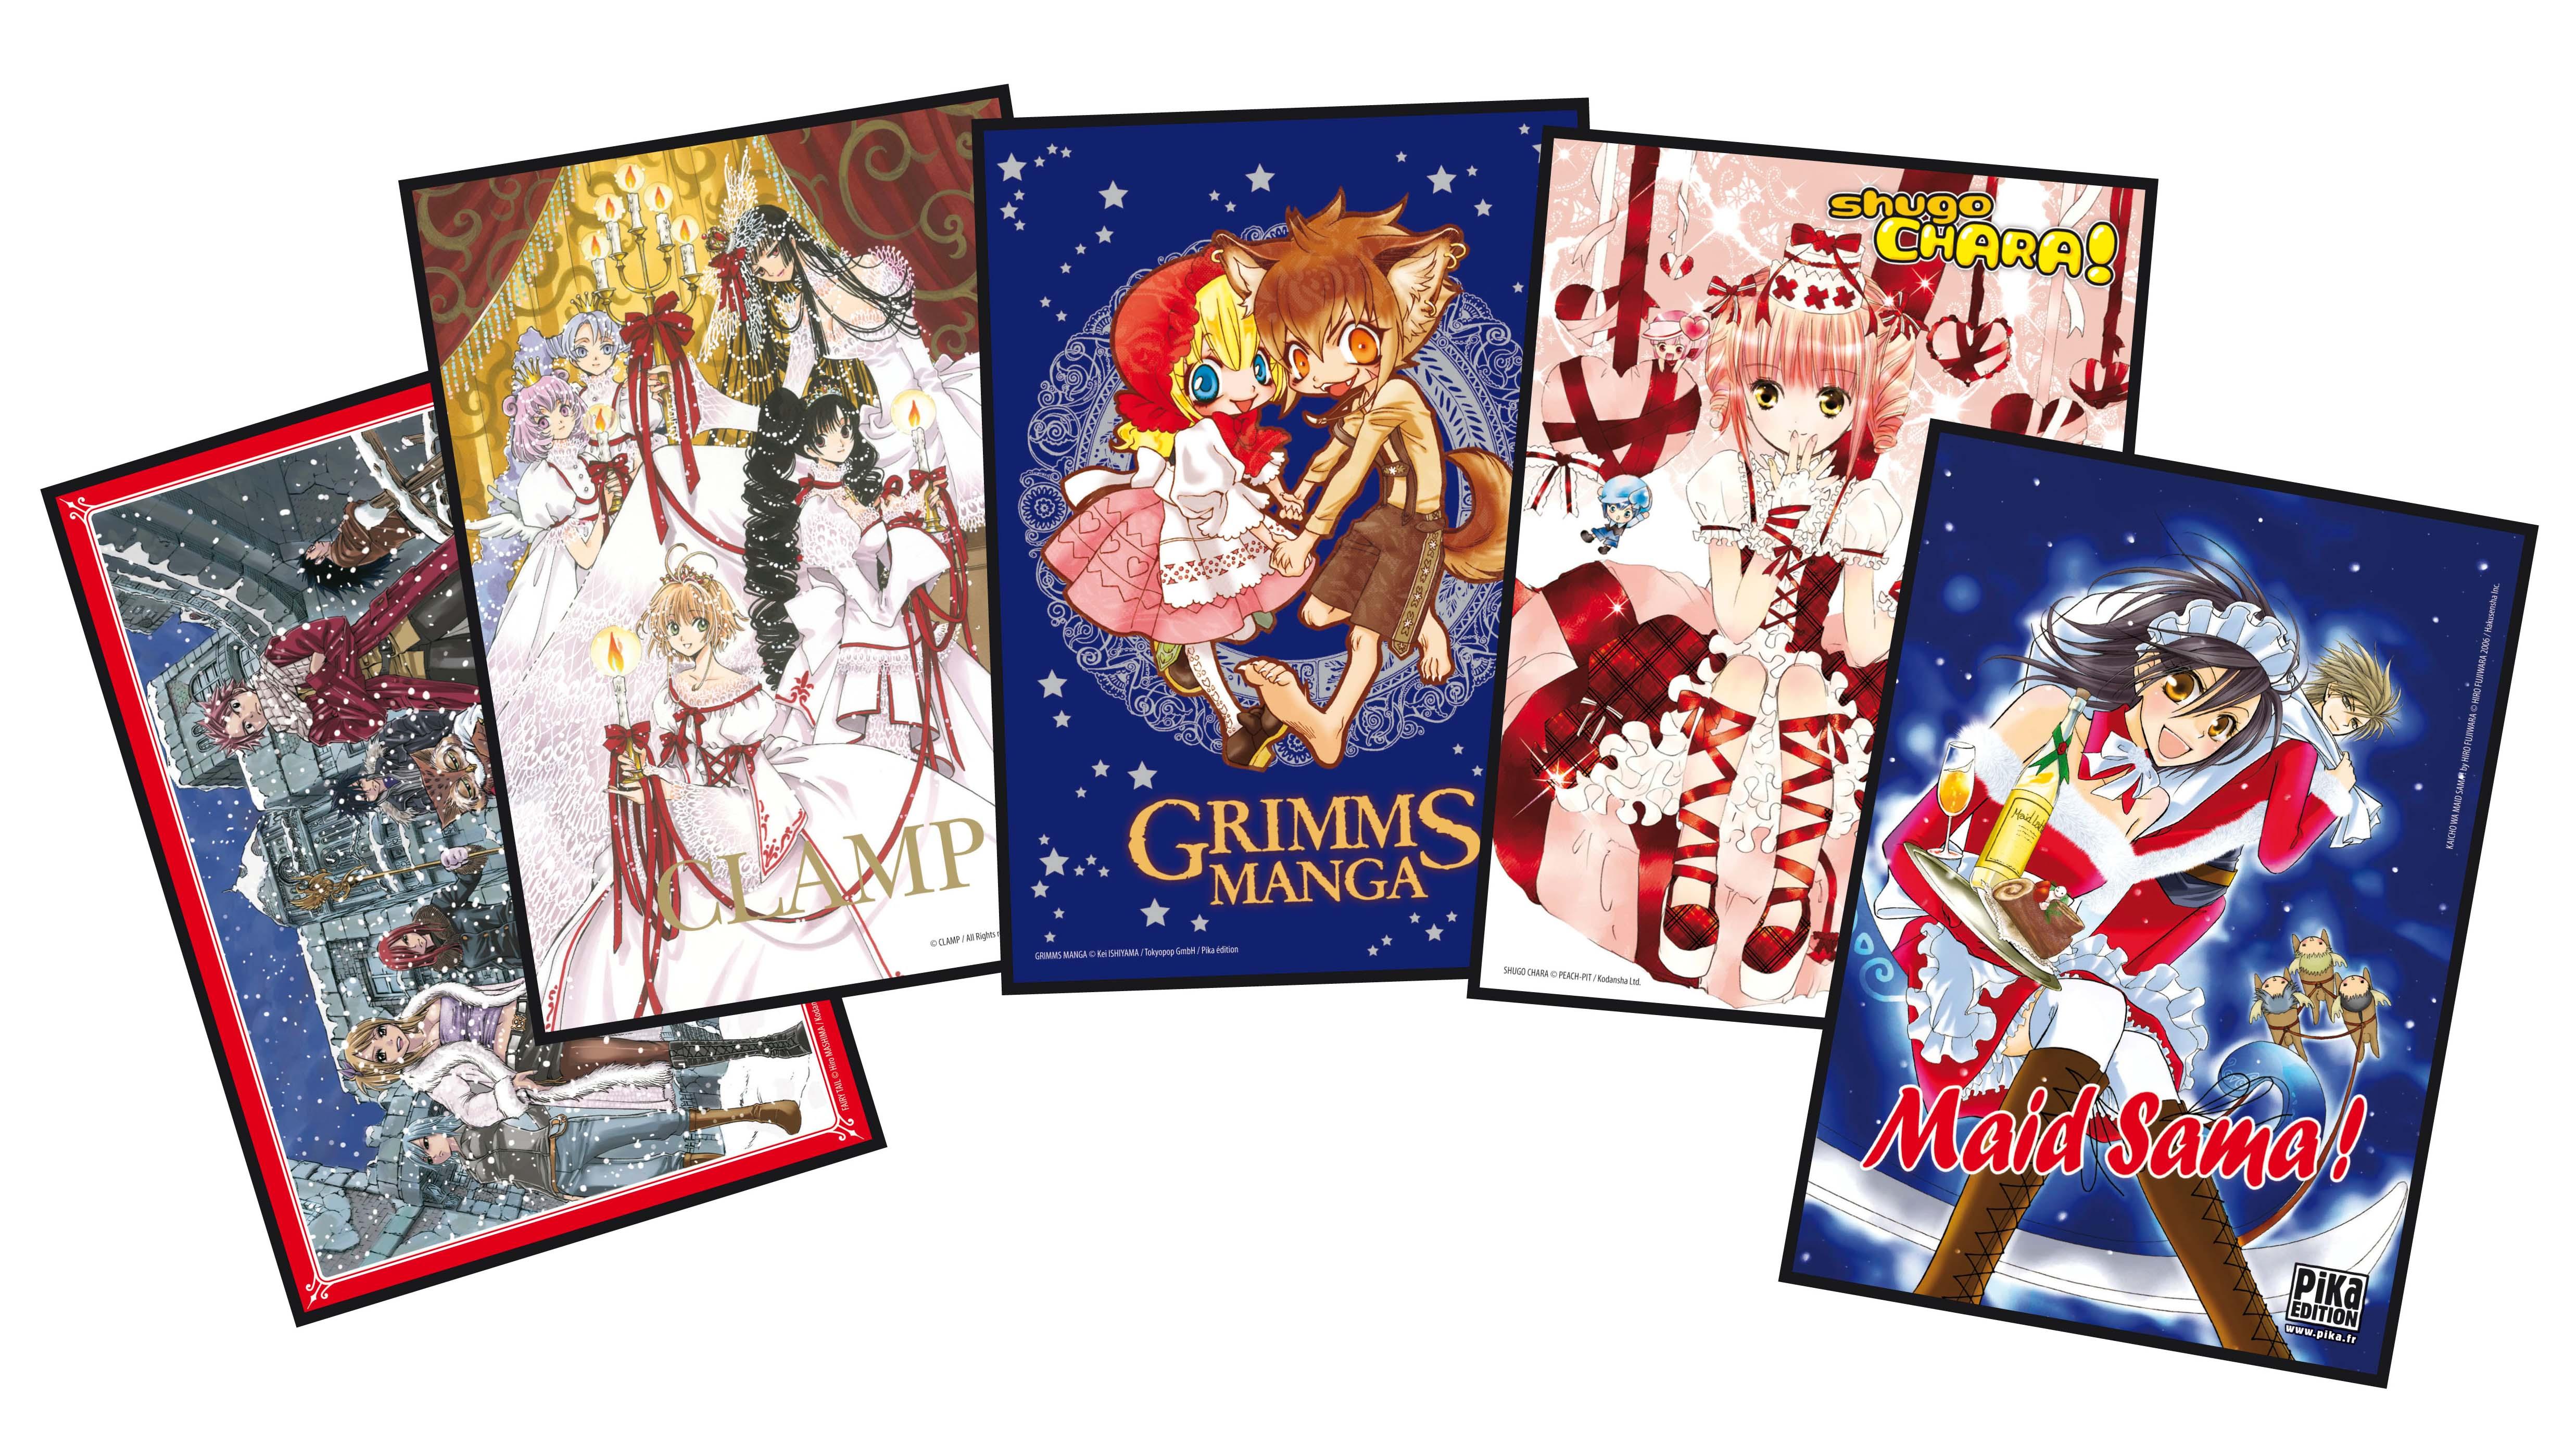 http://www.mangaconseil.com/img/blog/cartespika.jpg